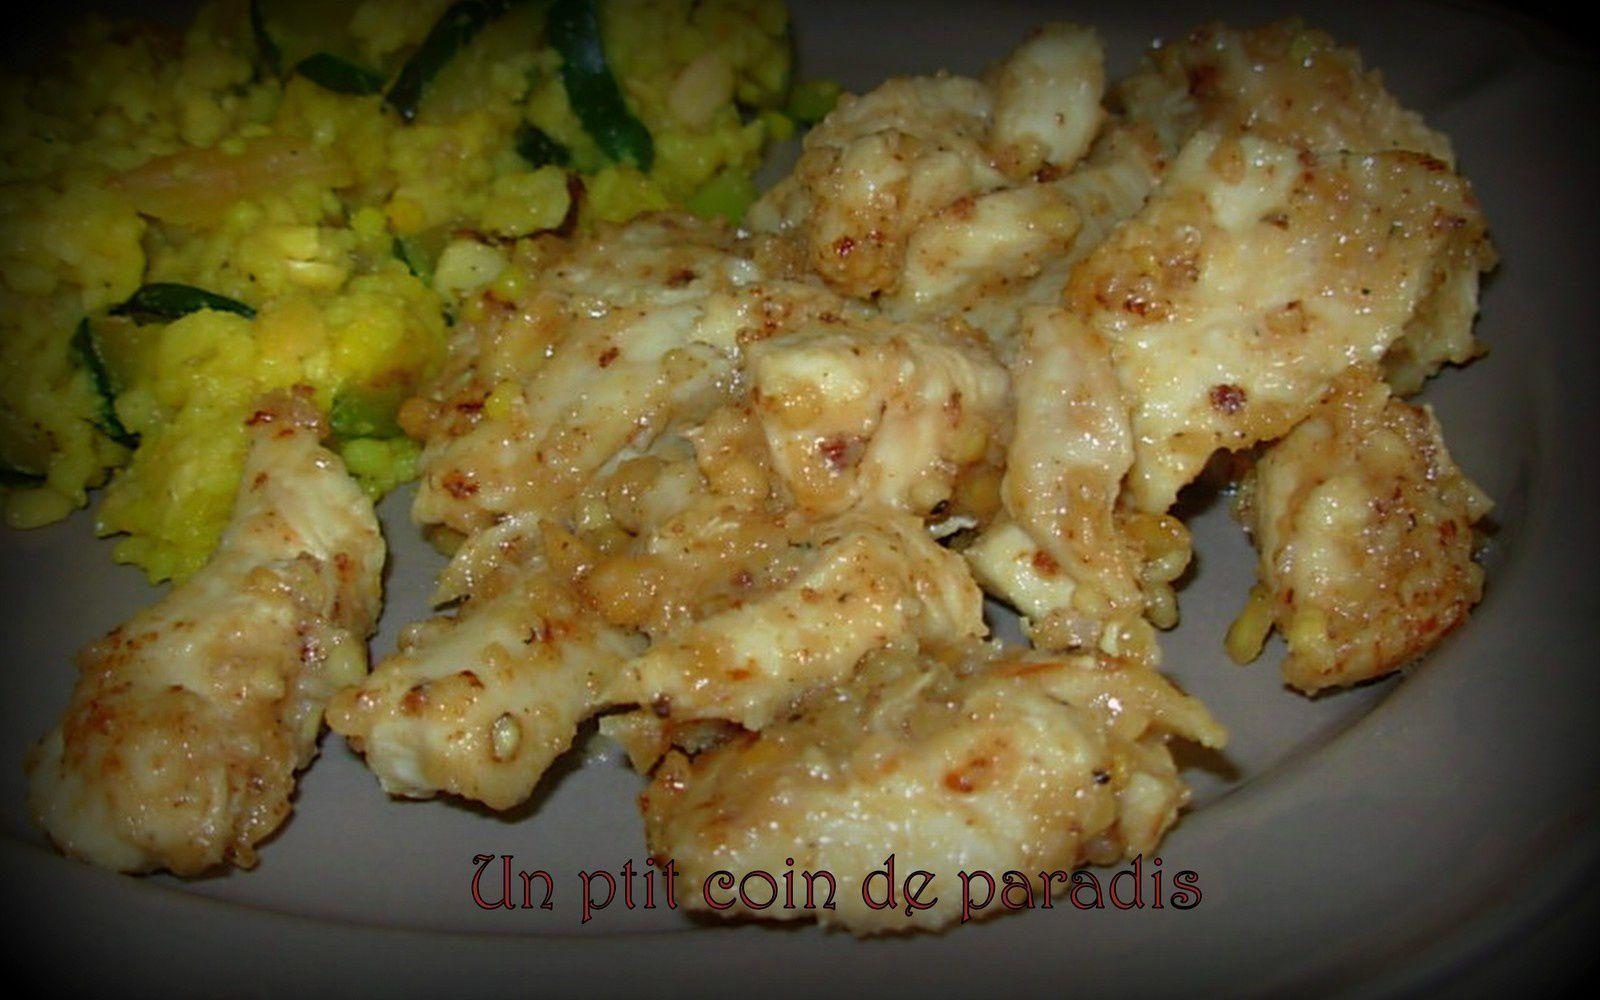 Poulet au beurre de cacahuètes home-made